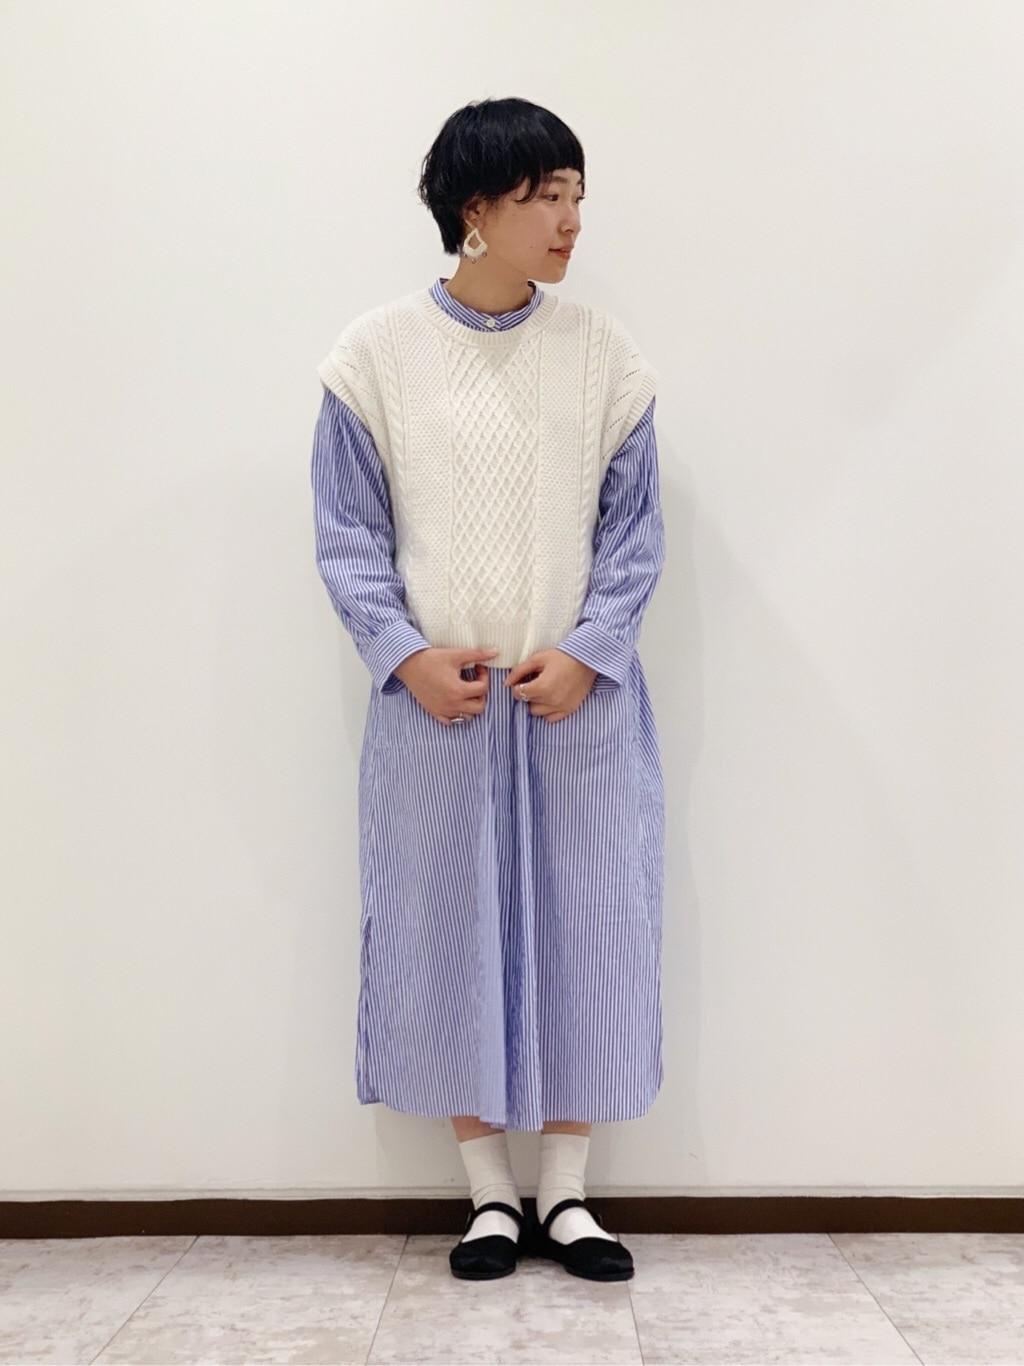 bulle de savon 新宿ミロード 身長:159cm 2020.01.28